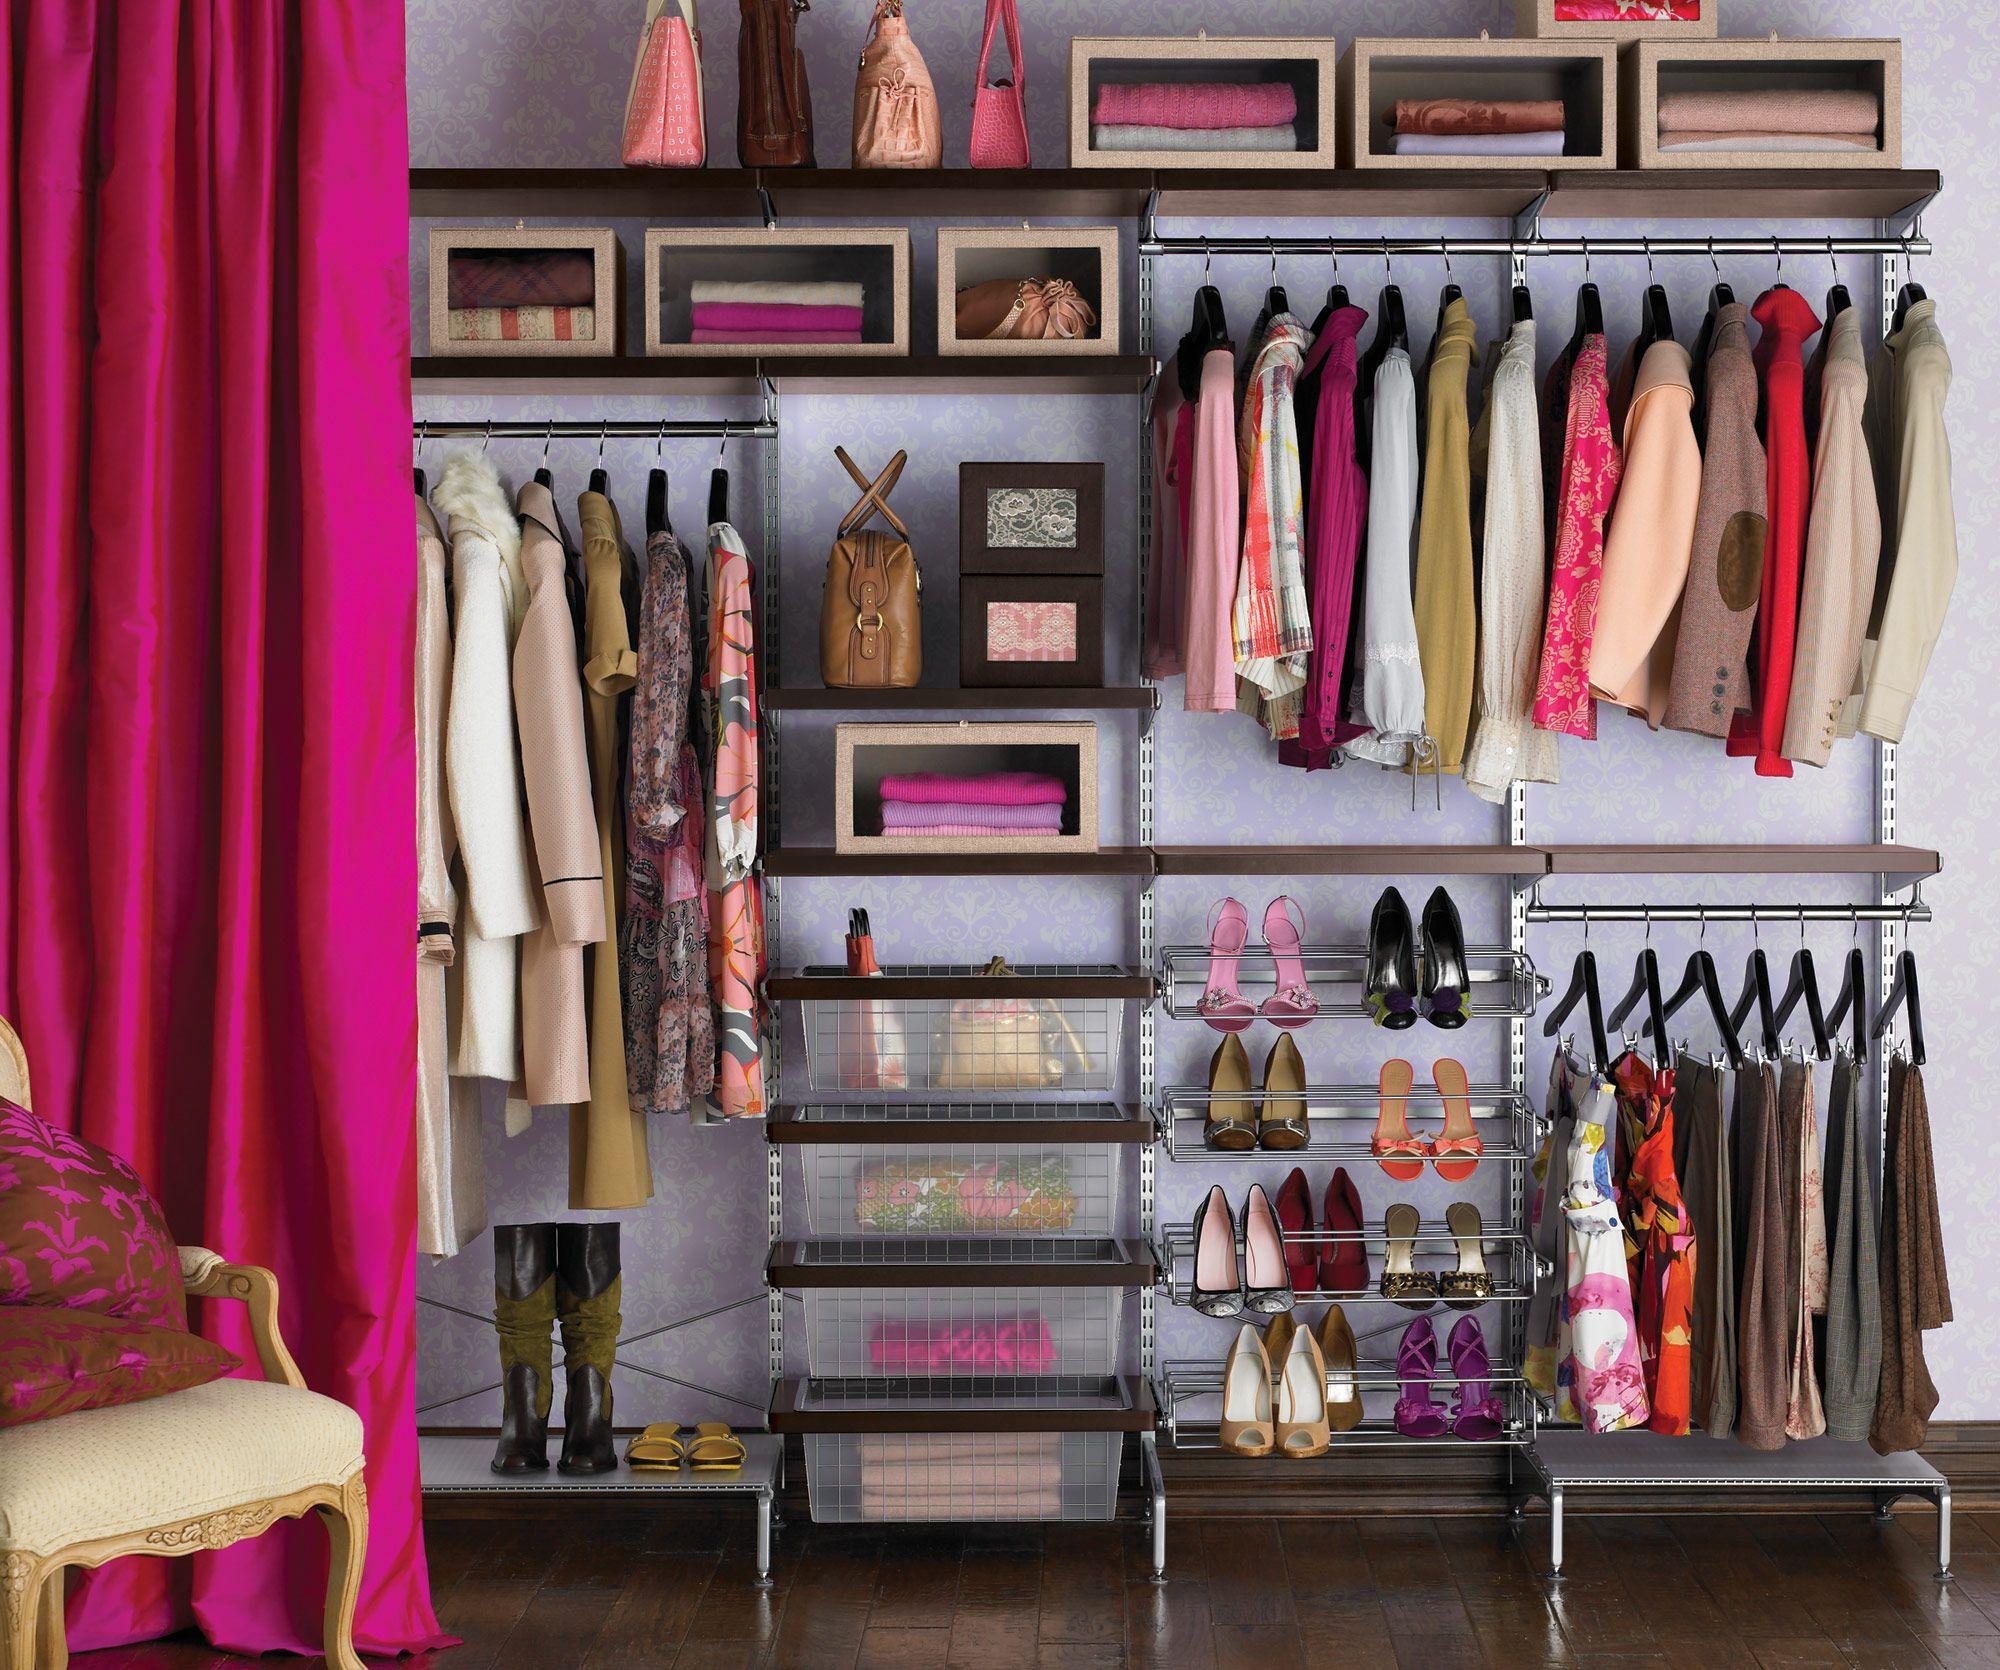 closet home skillful wadrobe l shelf shelving ideas open design